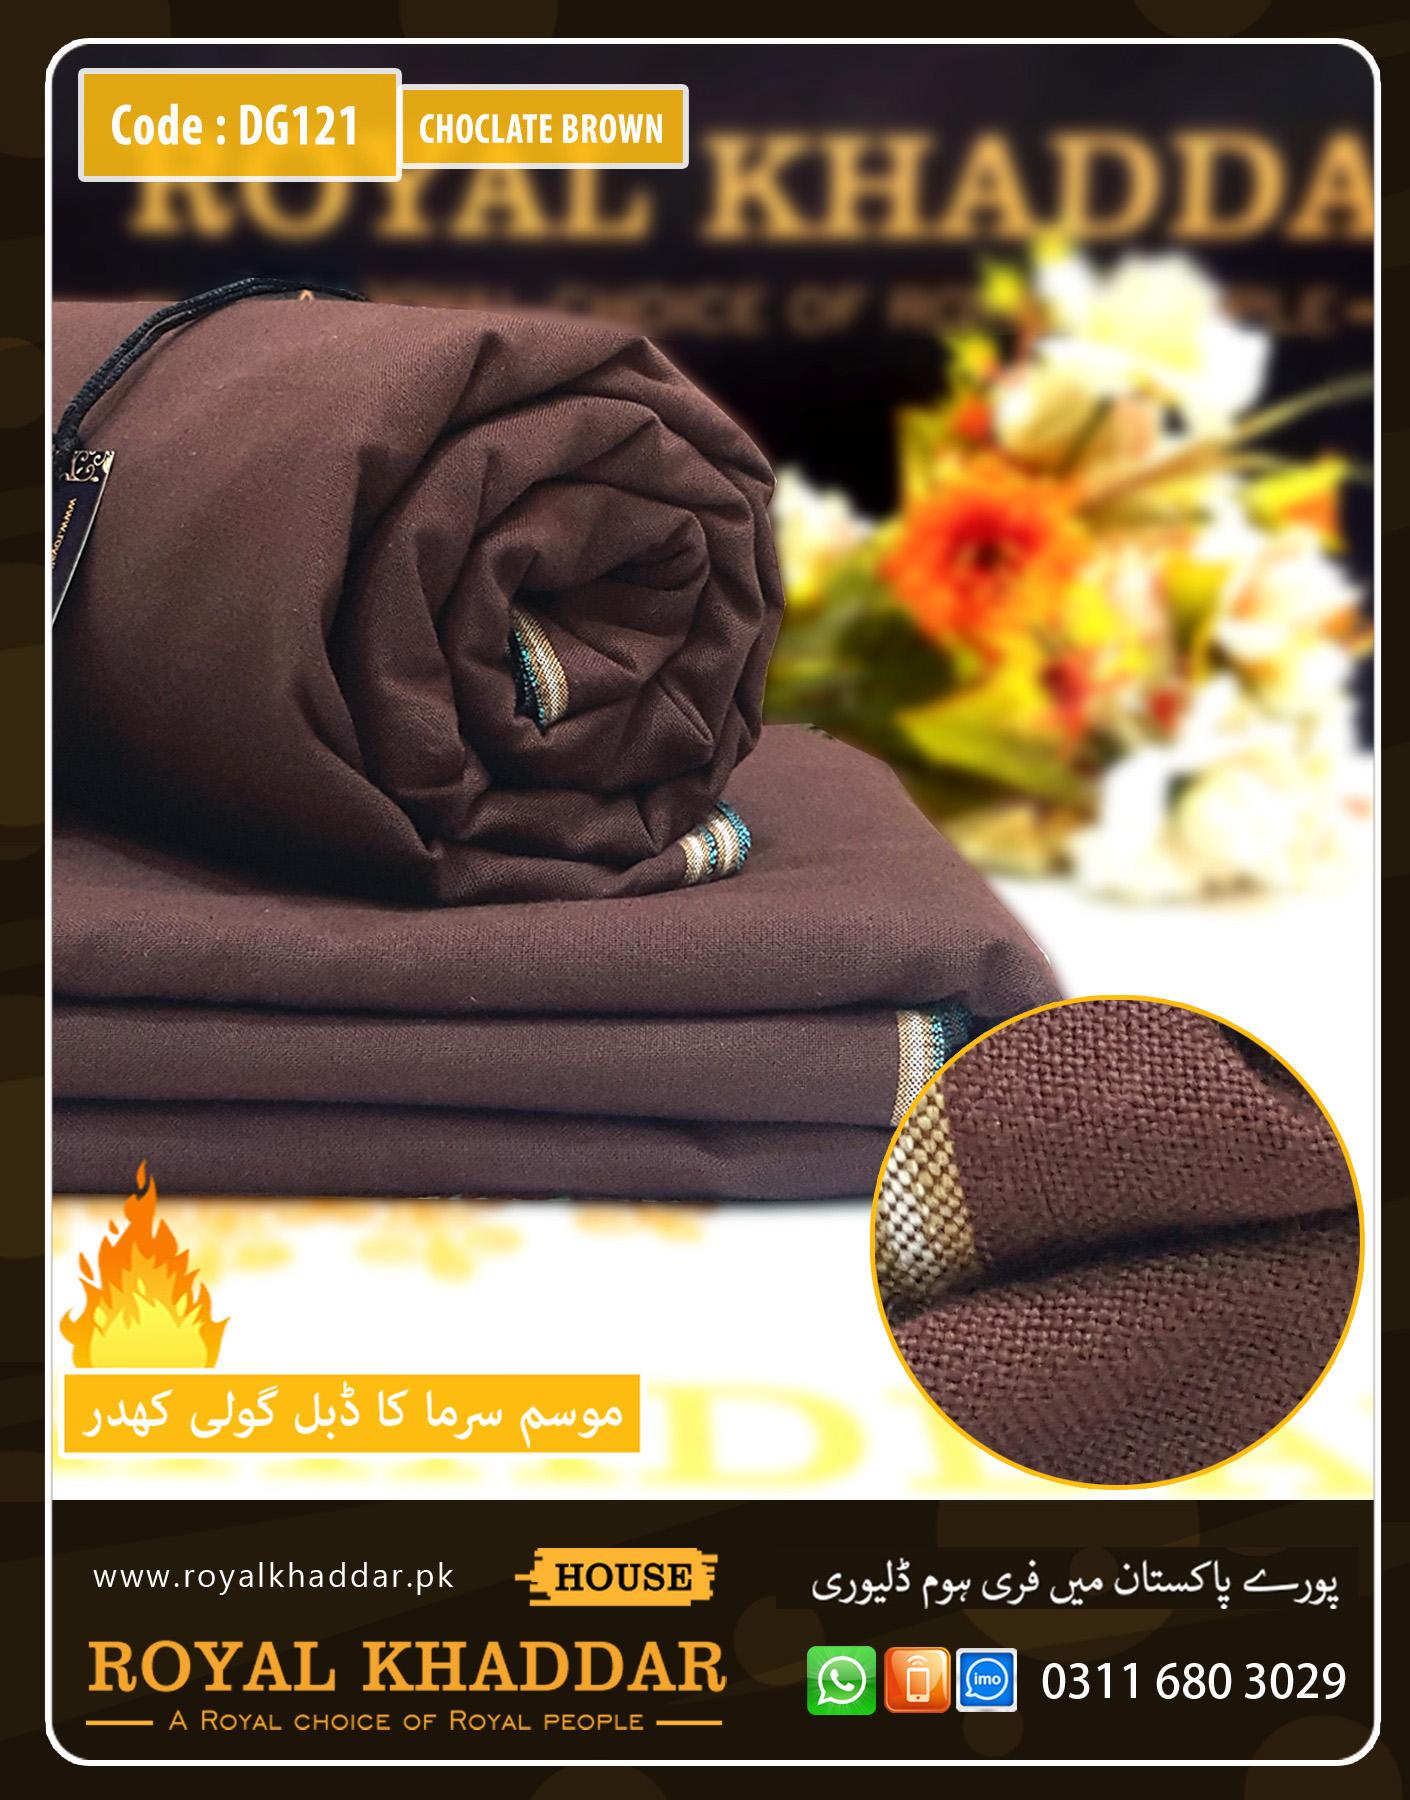 DG121 Chocolate Brown Double Goli Winter Khaddar